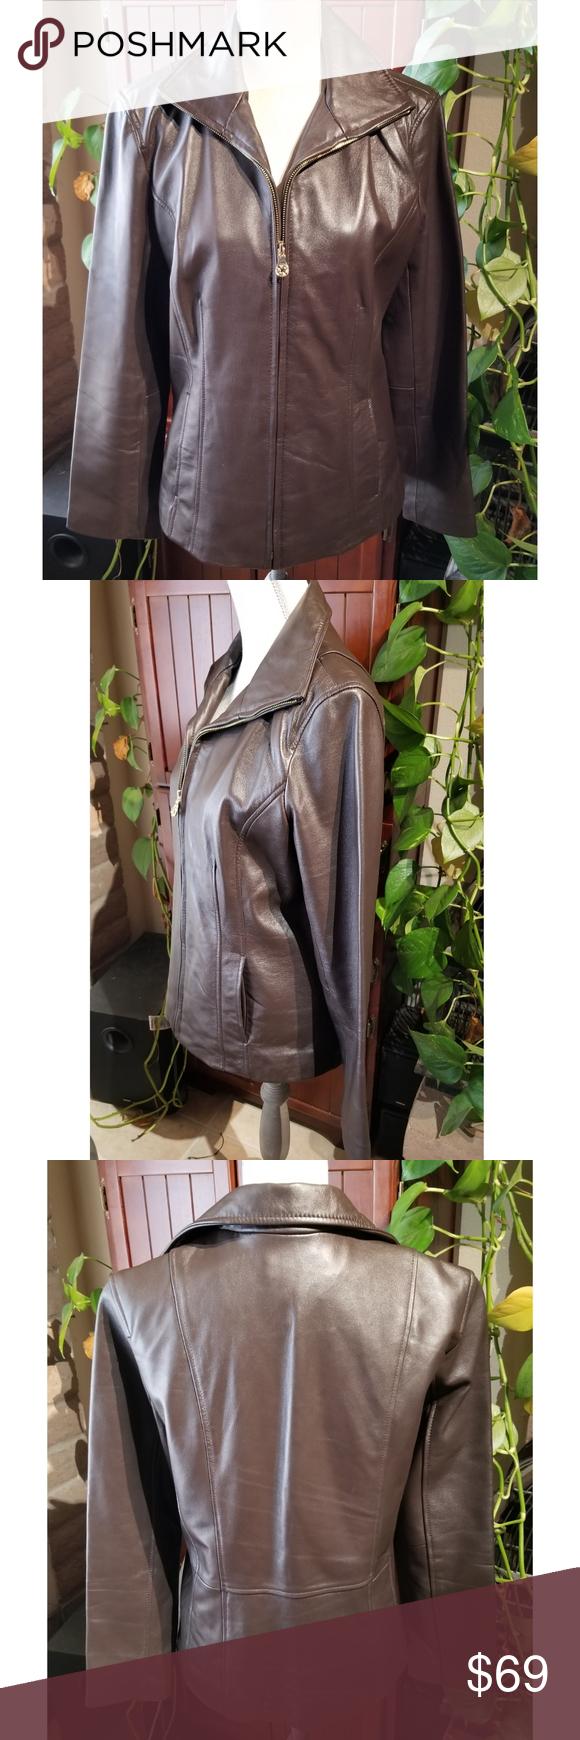 Jaclyn Smith Brand Genuine Leather Jacket Jaclyn Smith Brand Genuine Leather Jacket Size L Smooth Grain Genuine Leather Jackets Leather Jacket Clothes Design [ 1740 x 580 Pixel ]